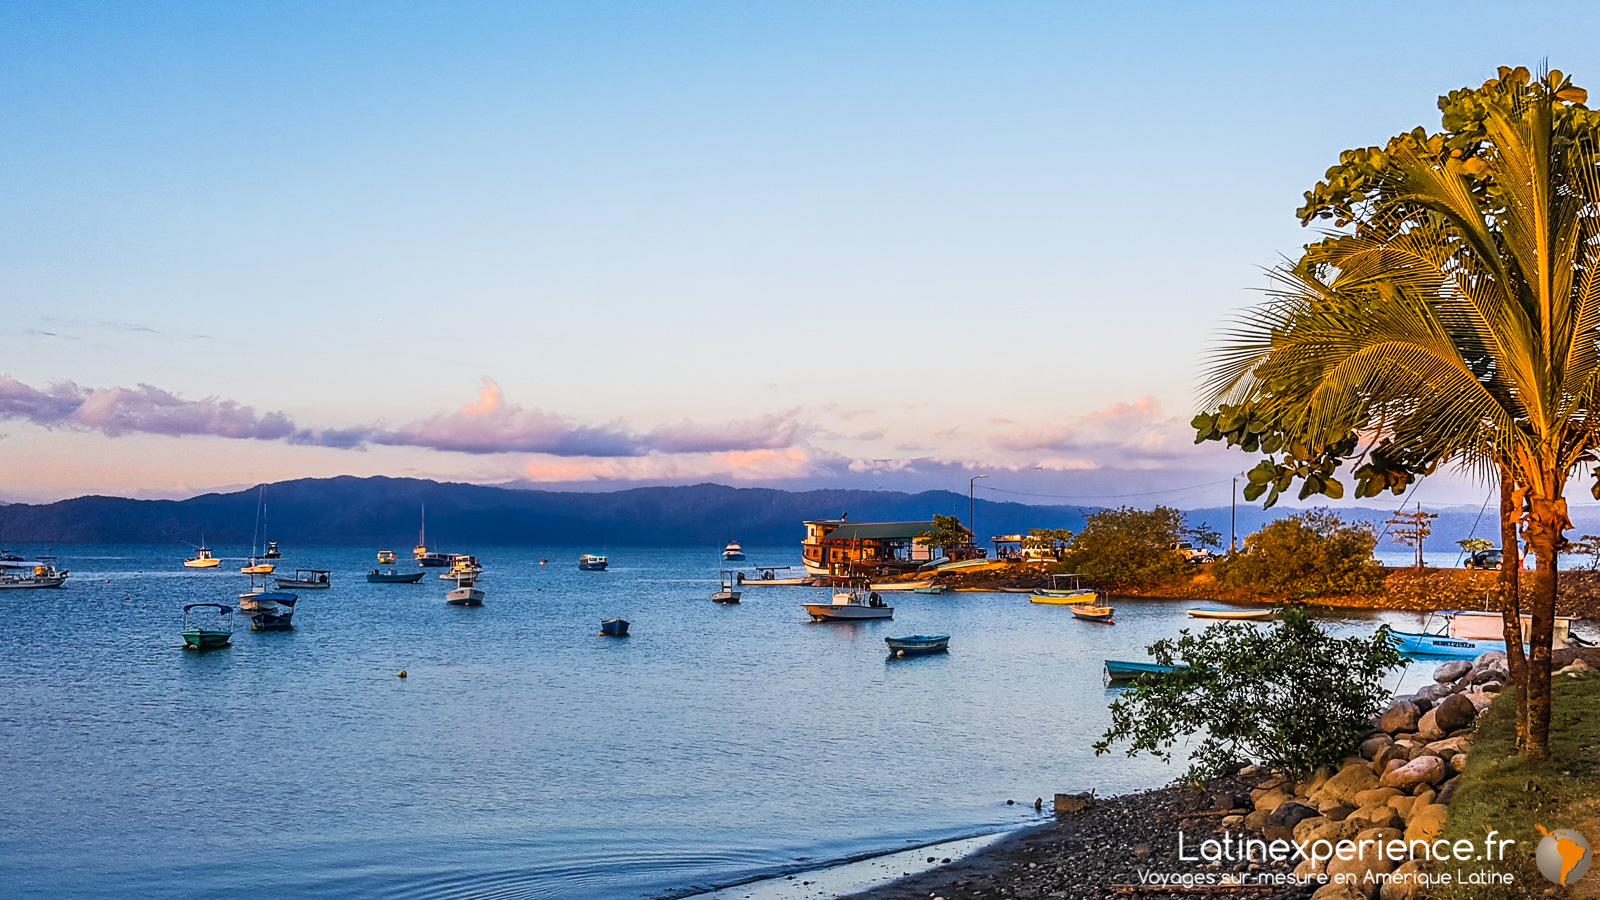 Costa Rica - Puerto Jimenez - Latinexperience voyages